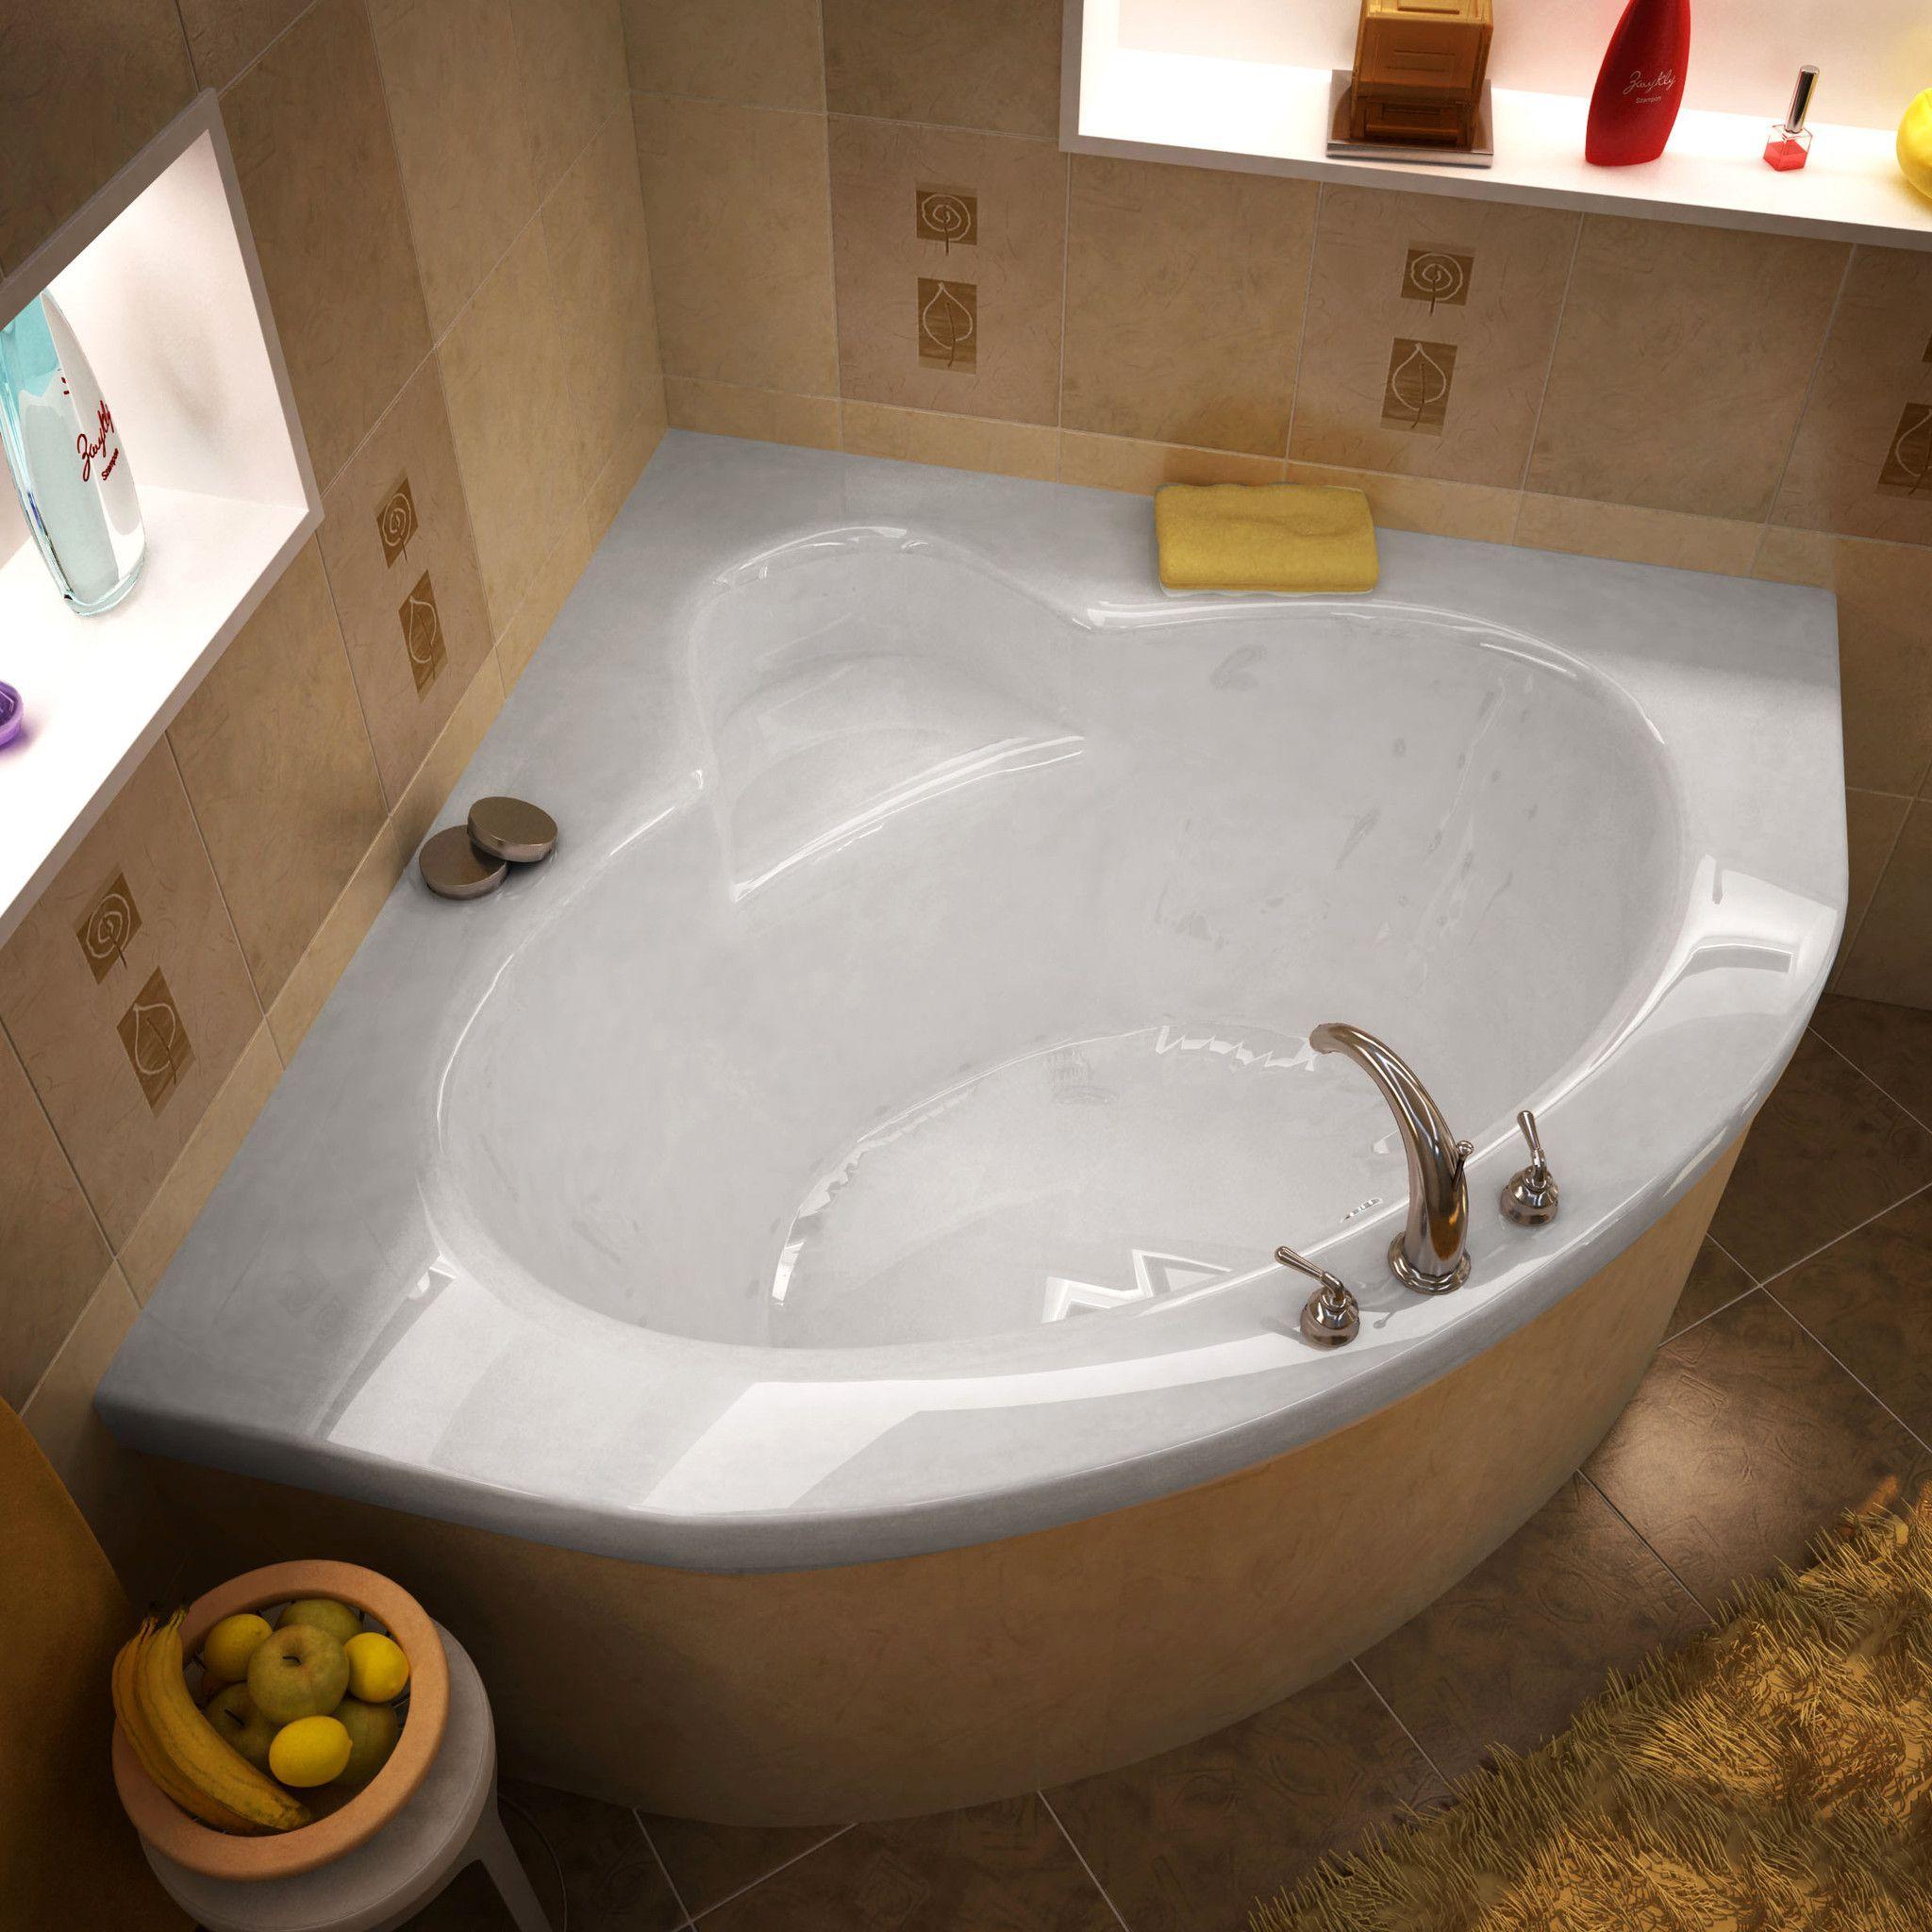 Atlantis Whirlpools 6060A Alexandria 60 X 60 Corner Soaking Bathtub